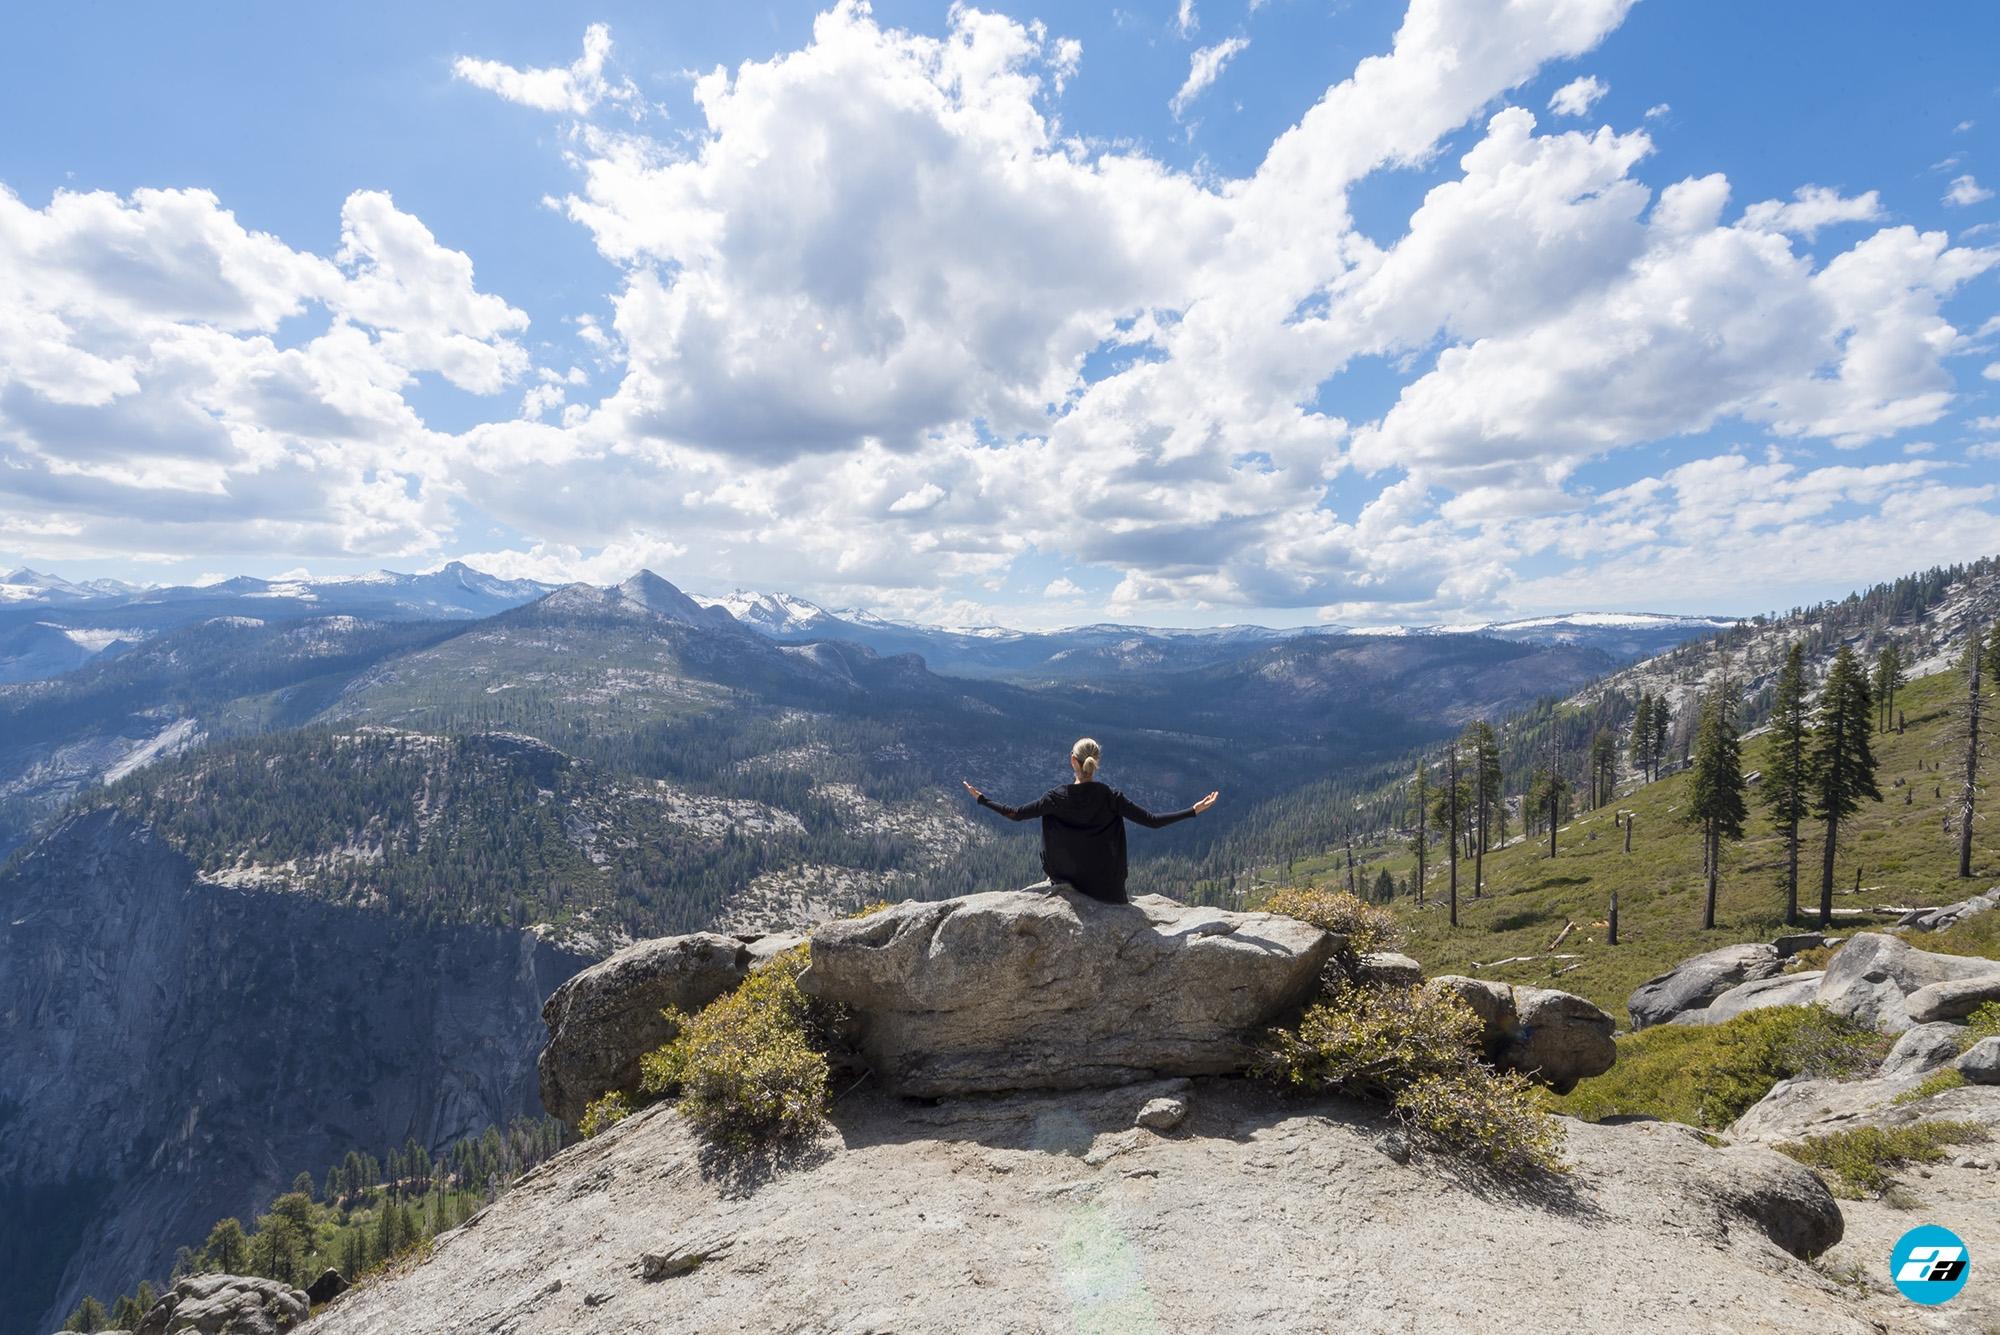 Yosemite National Park, California, USA. Landscape. Woman. Solitude. Mountain View. Glacier Point. Mountain Peaks